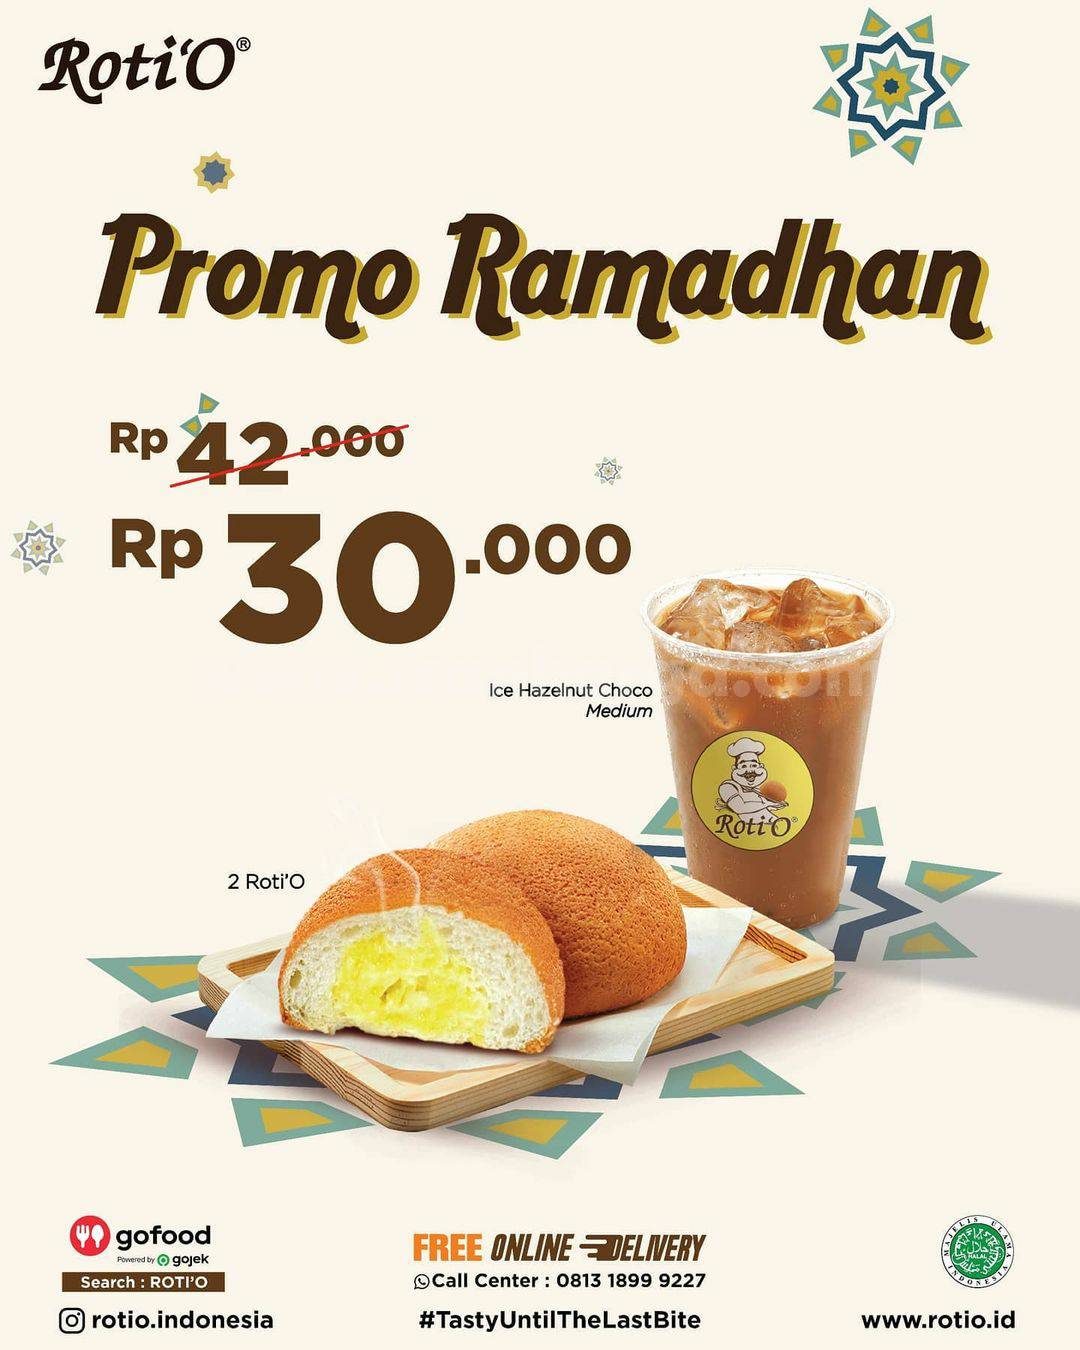 ROTI'O Promo RAMADHAN - Beli 2 Roti'O + Ice Hazelnut Chocolate cuma Rp 30.000